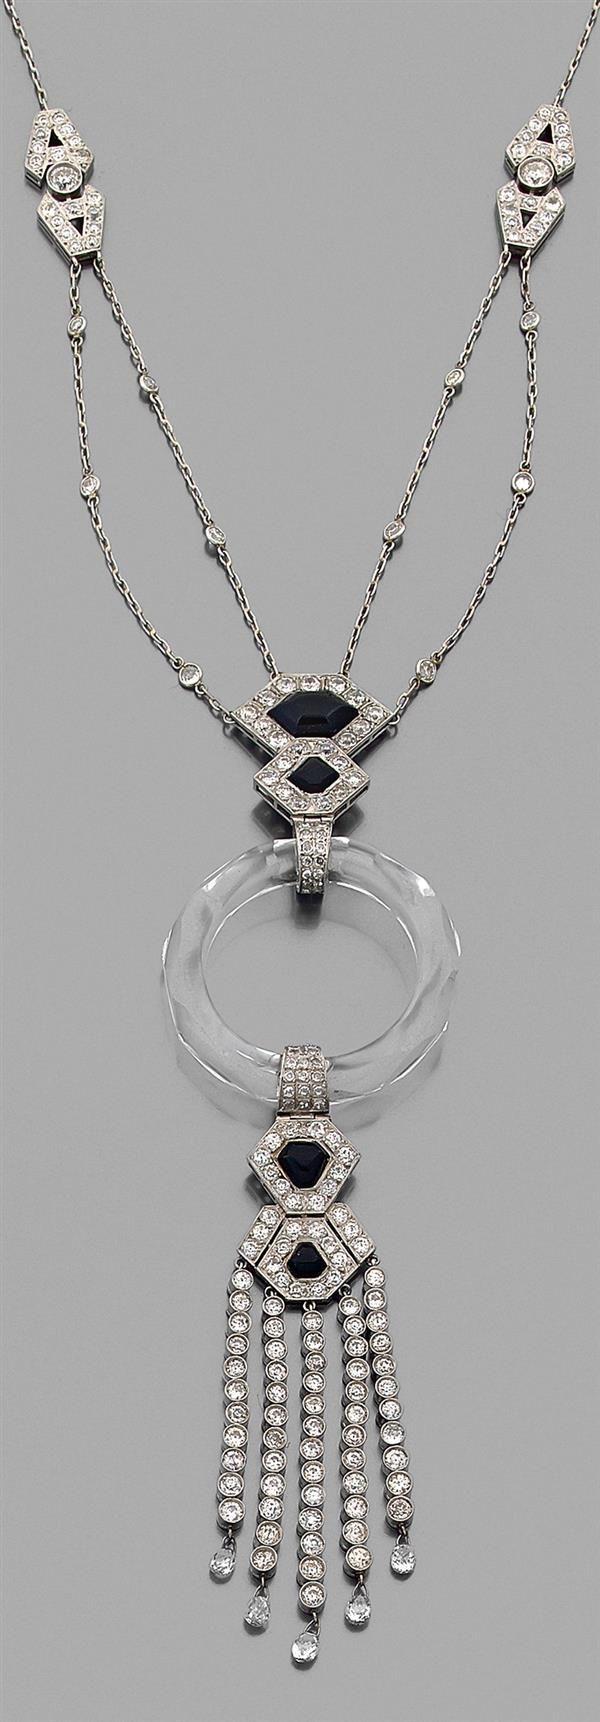 An Art Deco platinum, rock crystal, onyx and diamond necklace, 1930s.